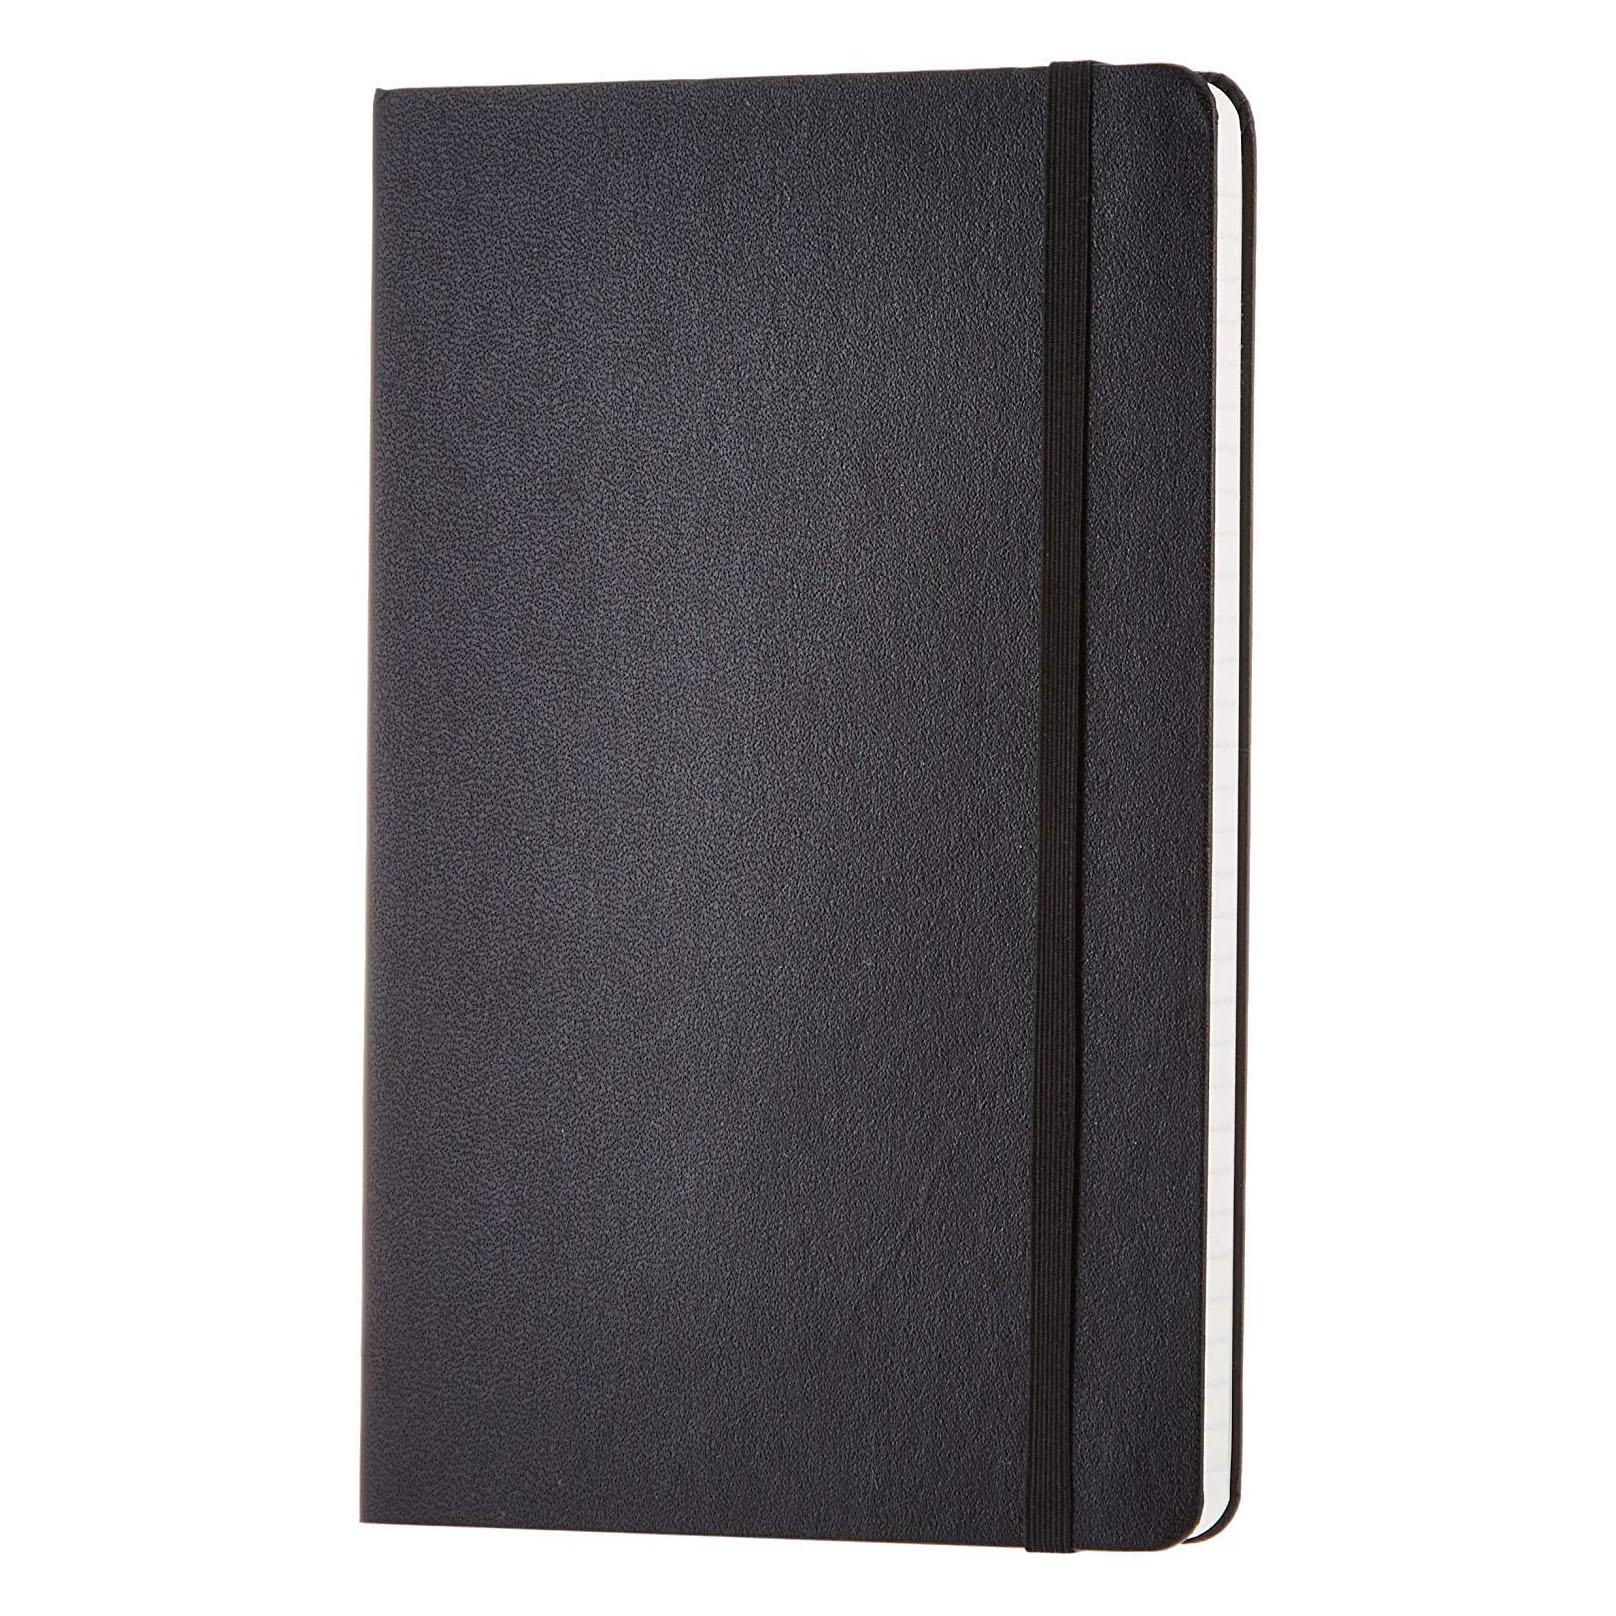 Amazon Basics Classic Lined Notebook